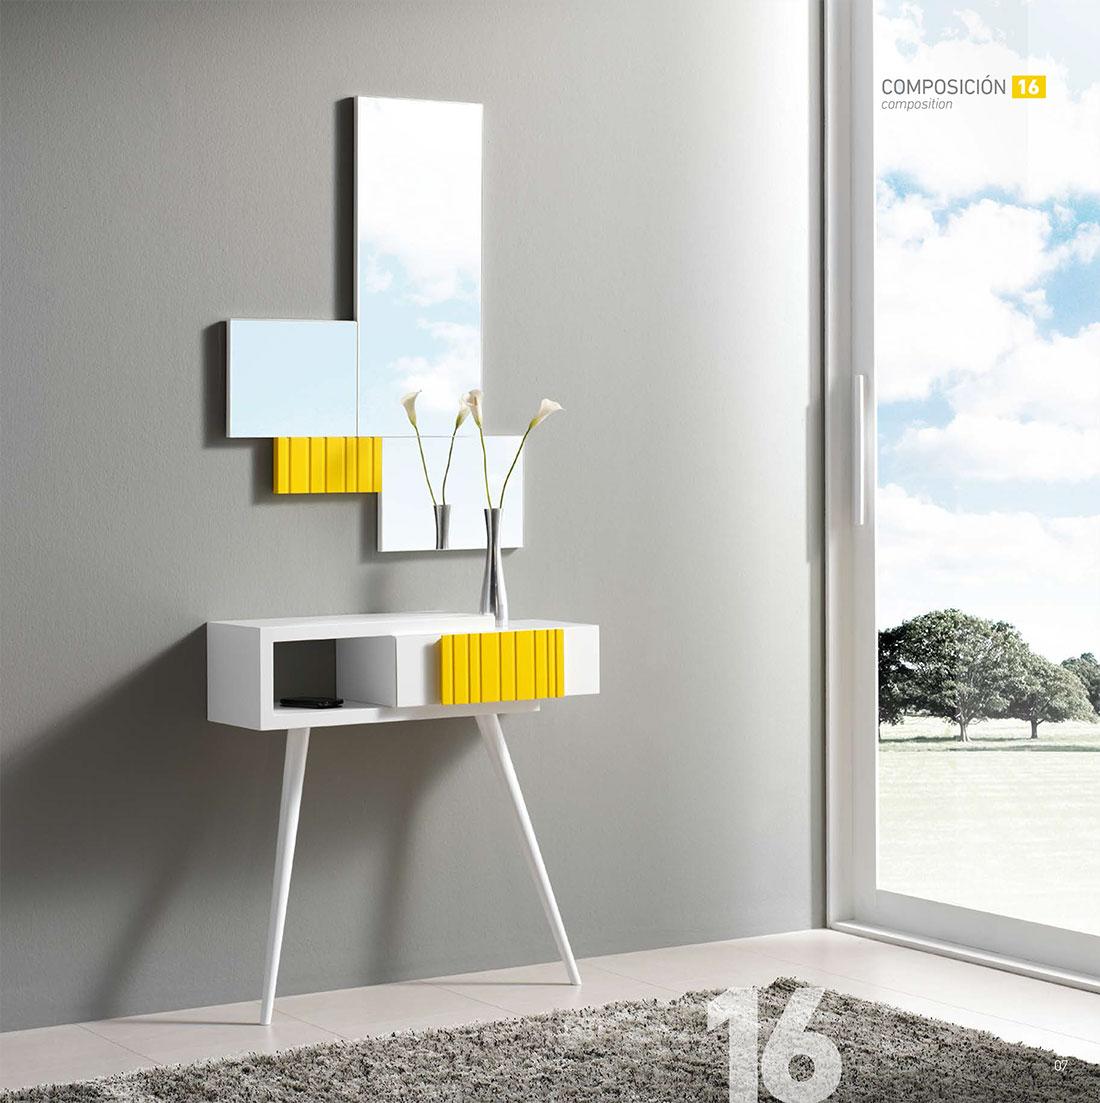 Como decorar un recibidor moderno espejo moderno para decorar recibidor muestrario de espejos - Como decorar un recibidor moderno ...